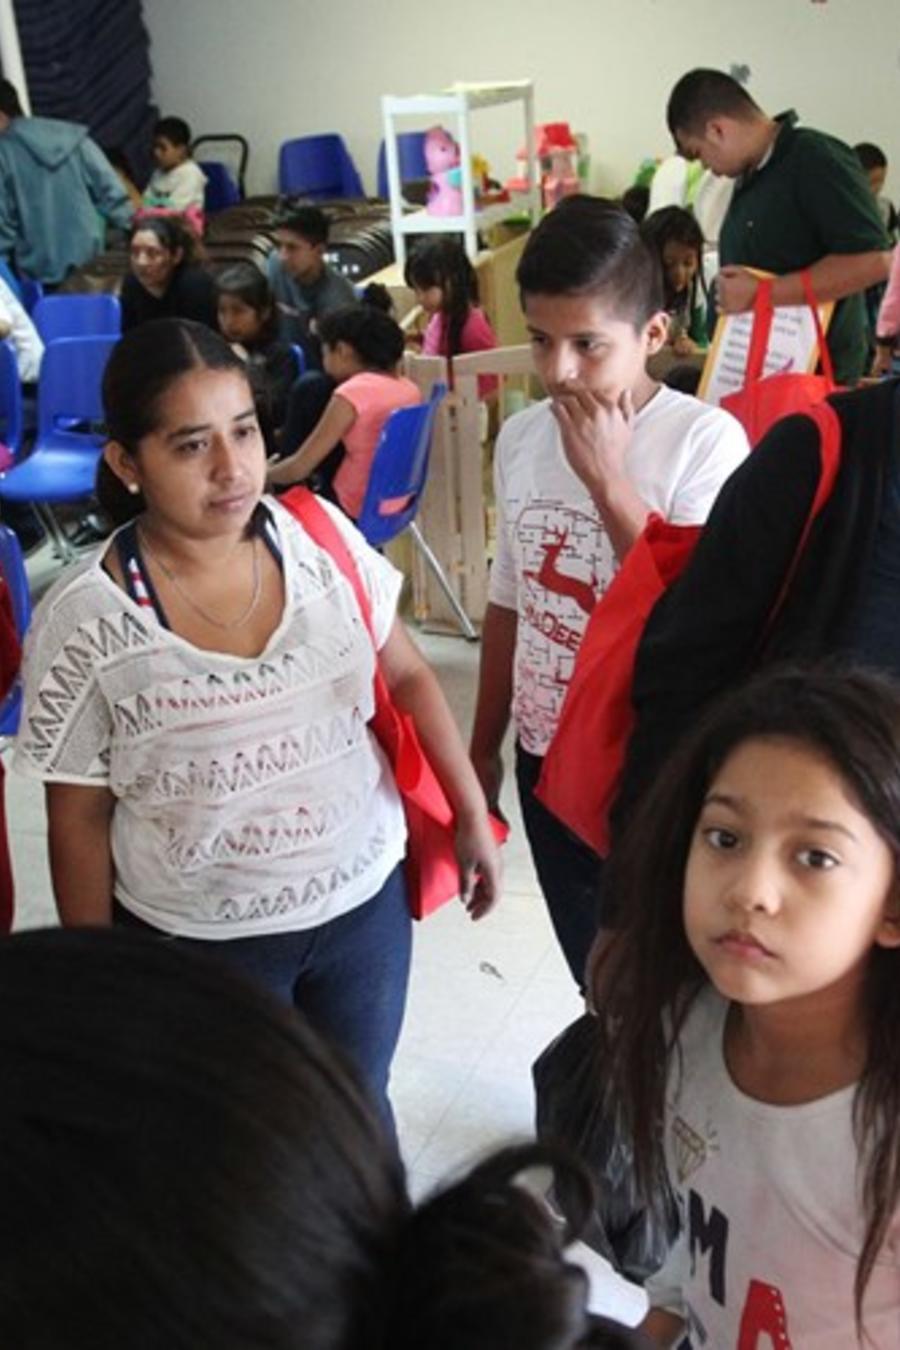 Familias en el Centro de Respiro Humanitario de Caridades Católicas en McAllen, Texas.Delcia Lopez / para NBC News